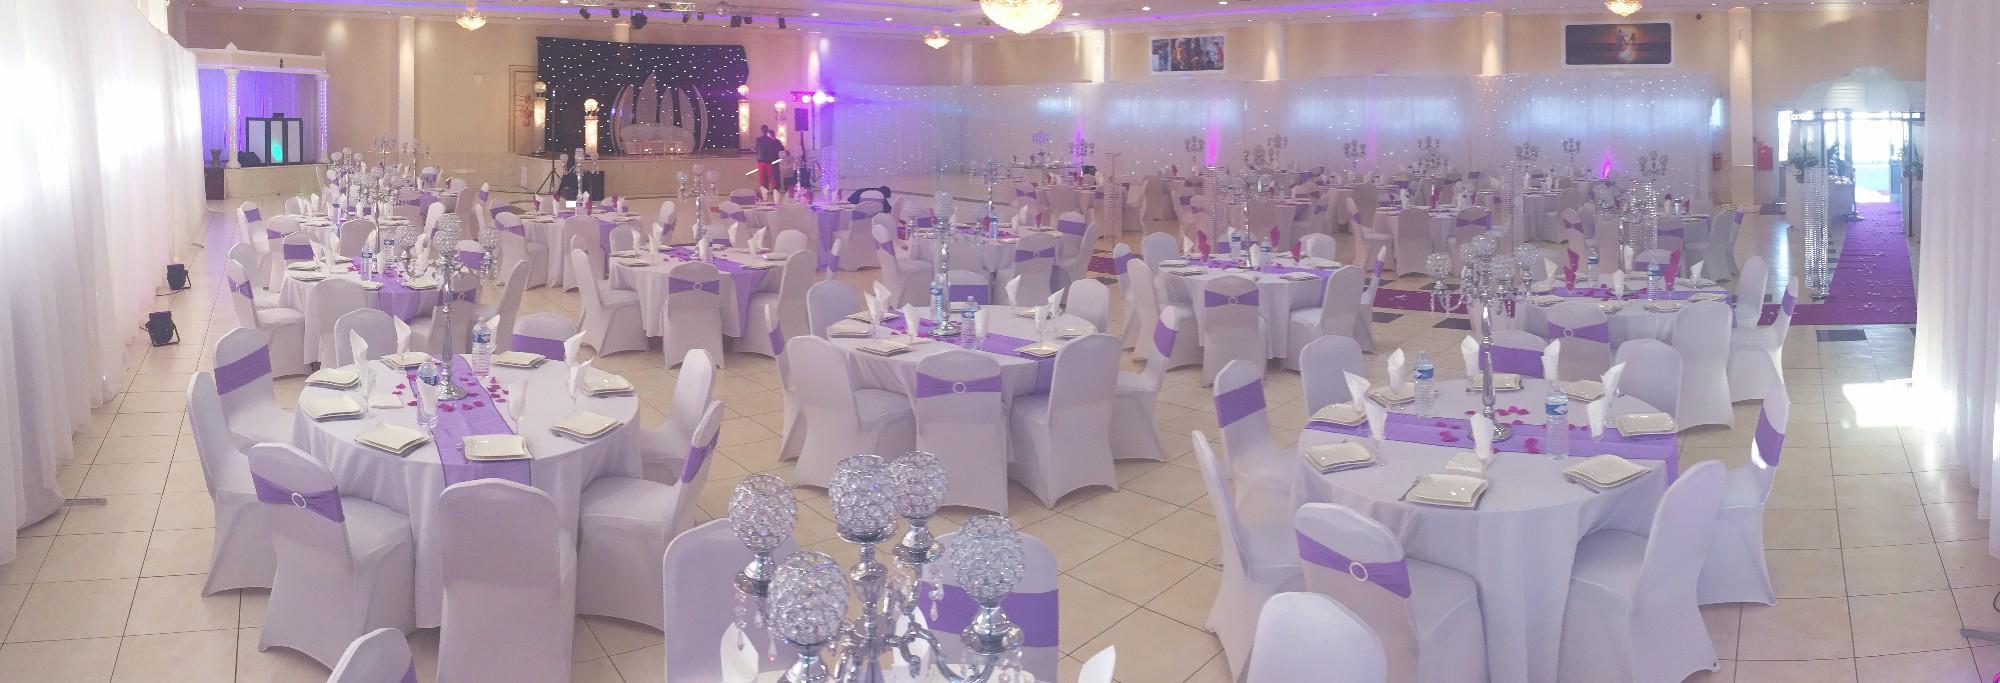 elysee mariage location de salle de r 233 ception pour mariage